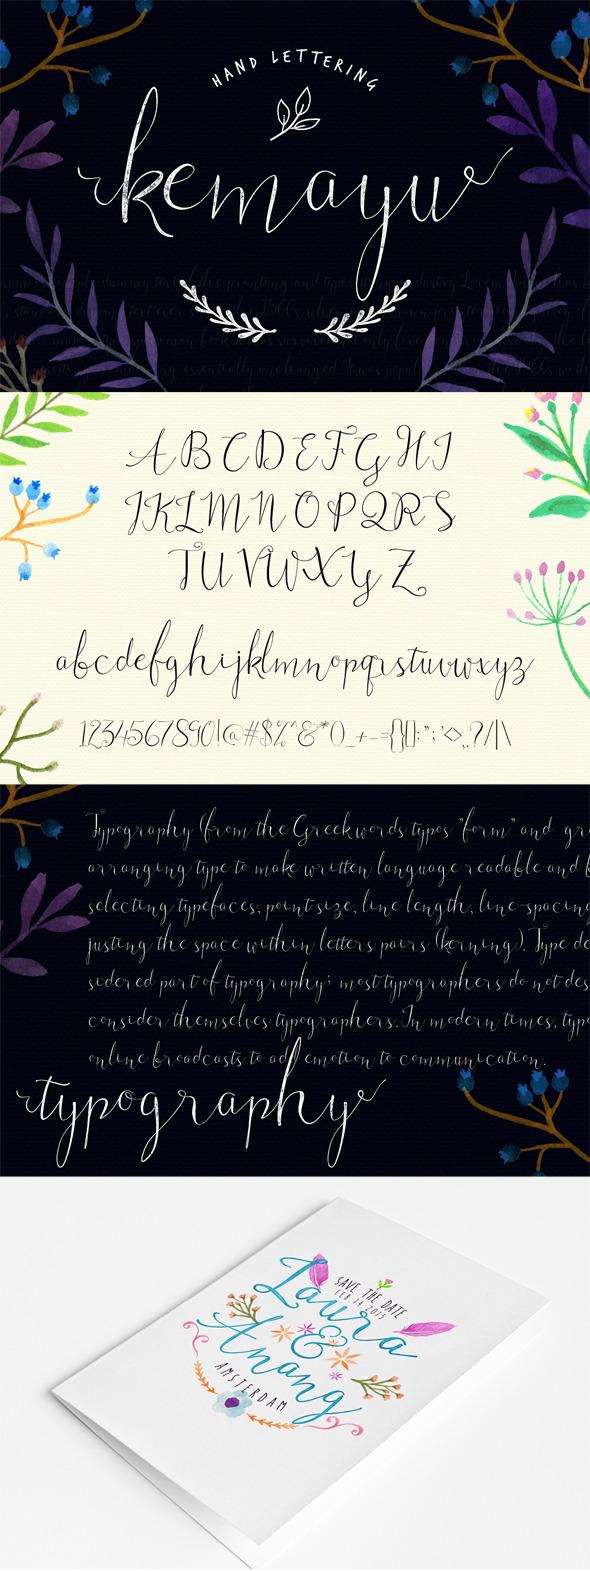 Kemayu Hand Lattering - Hand-writing Script